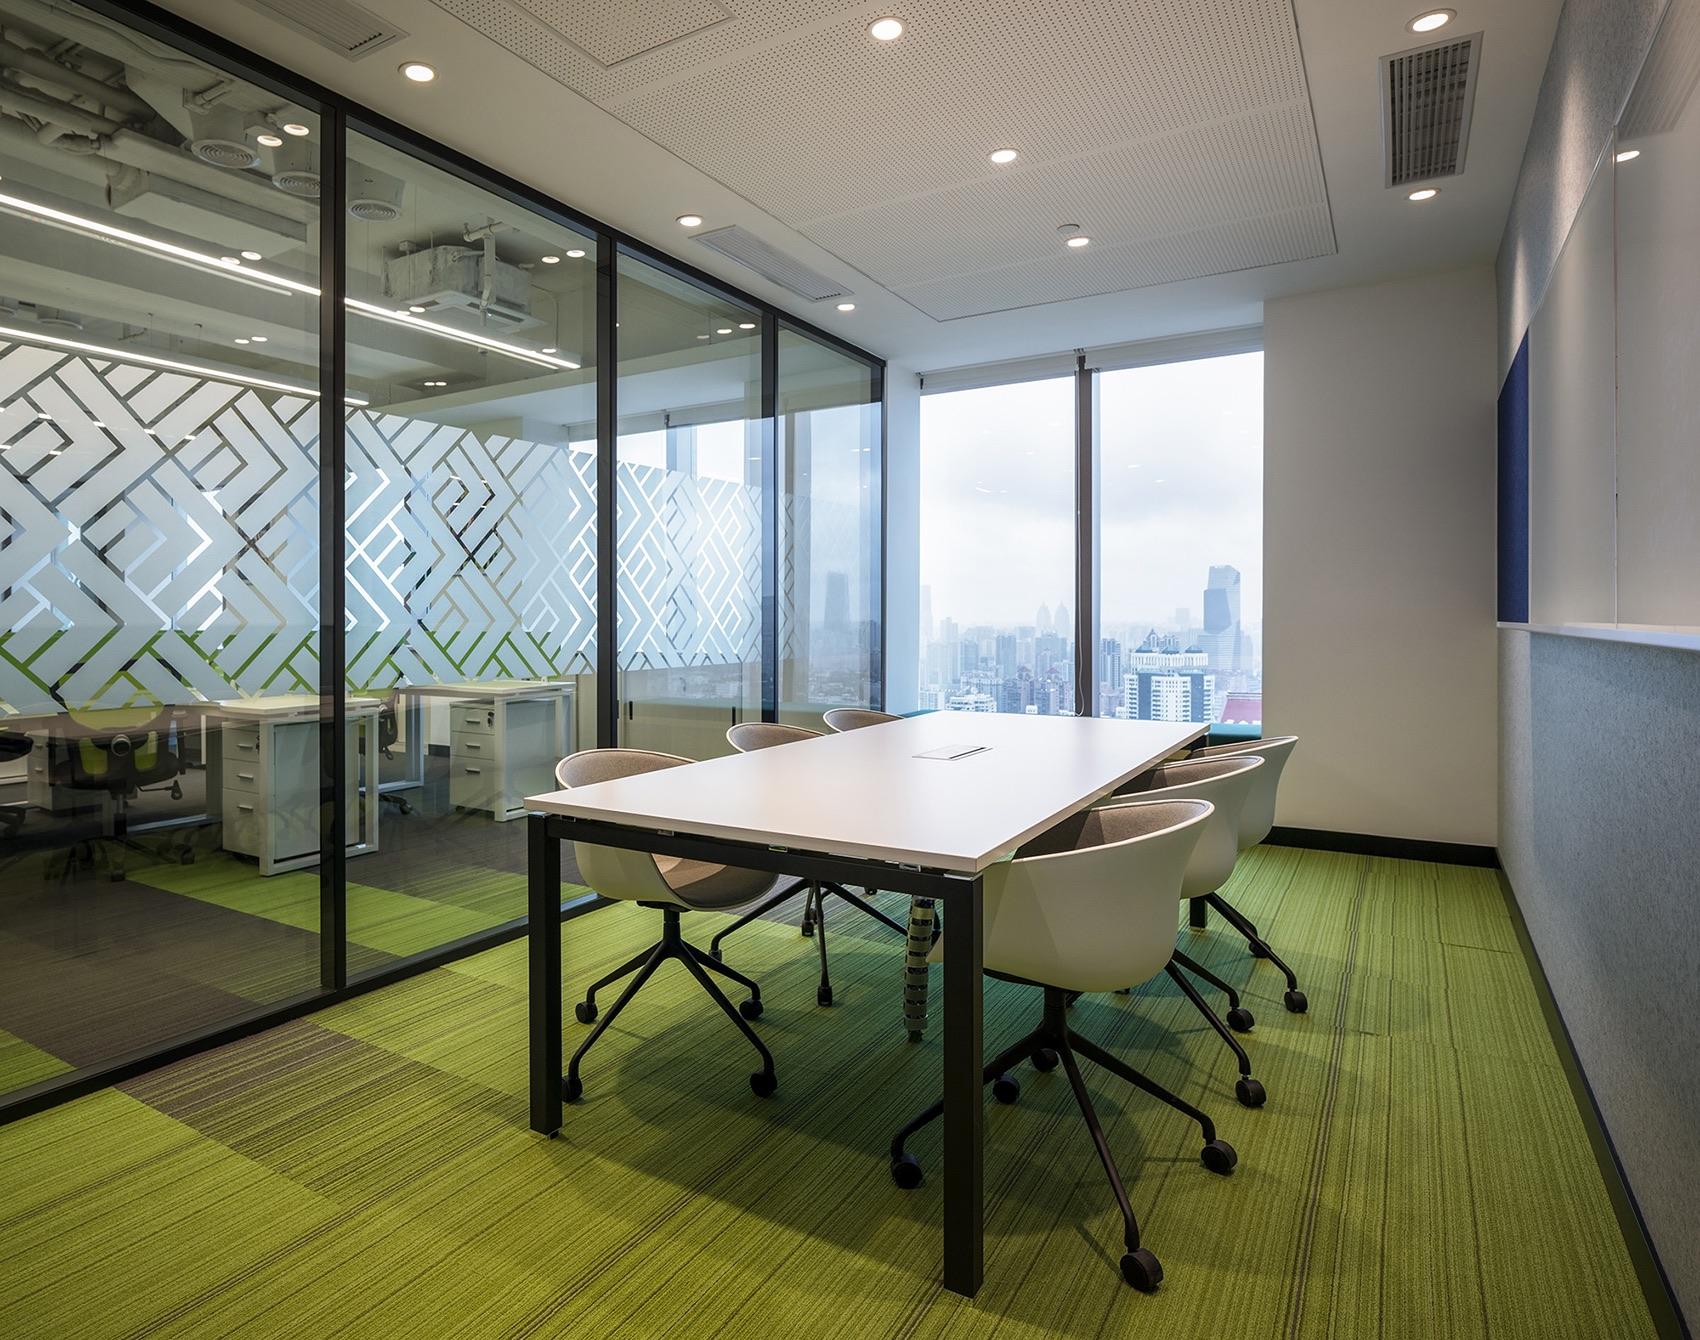 zespri-image-shanghai-office-8